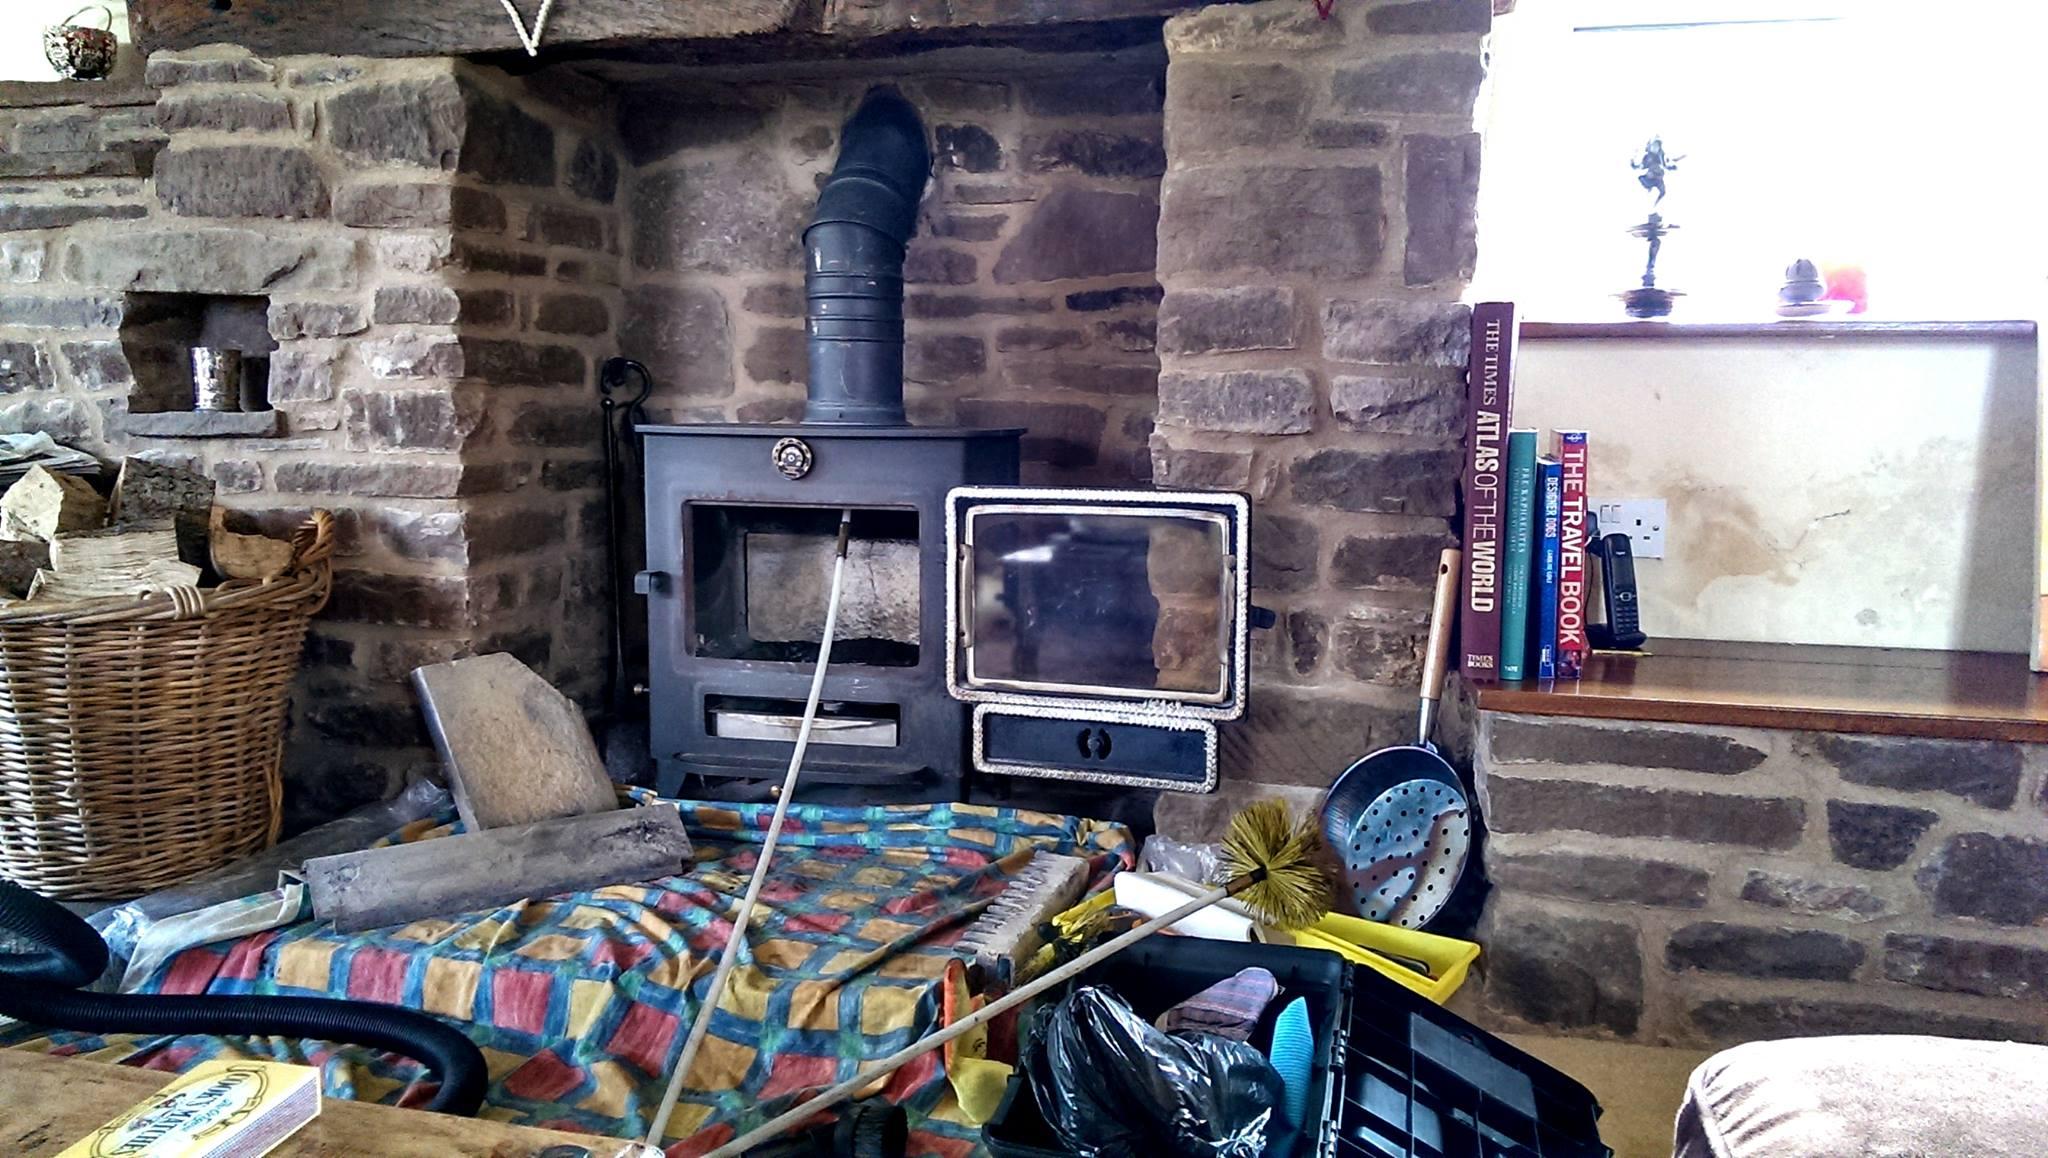 Latest Work - The Chimney Man